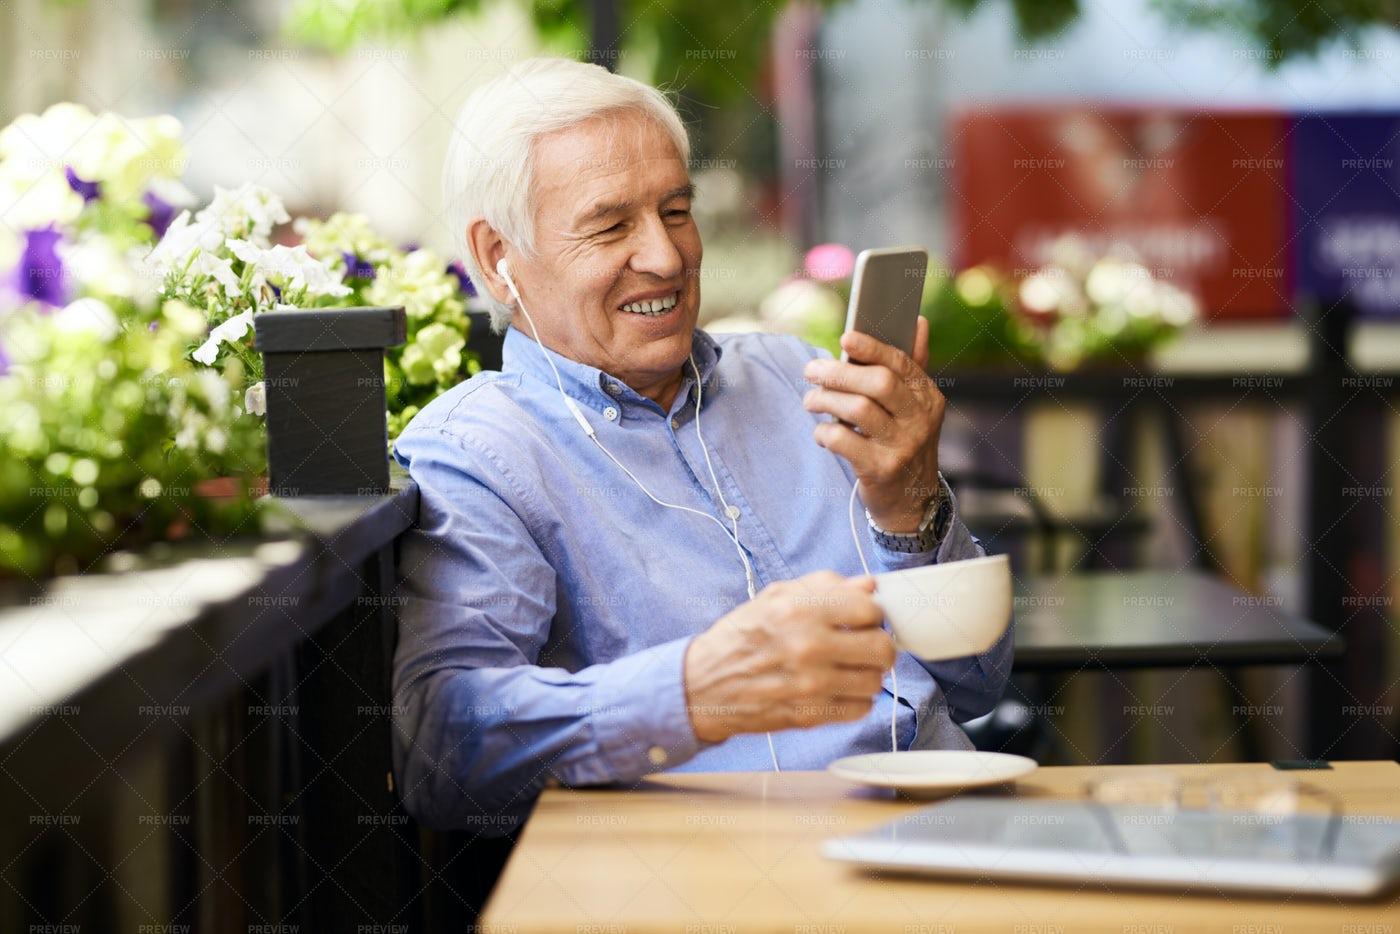 Senior Man Speaking By Video Call...: Stock Photos